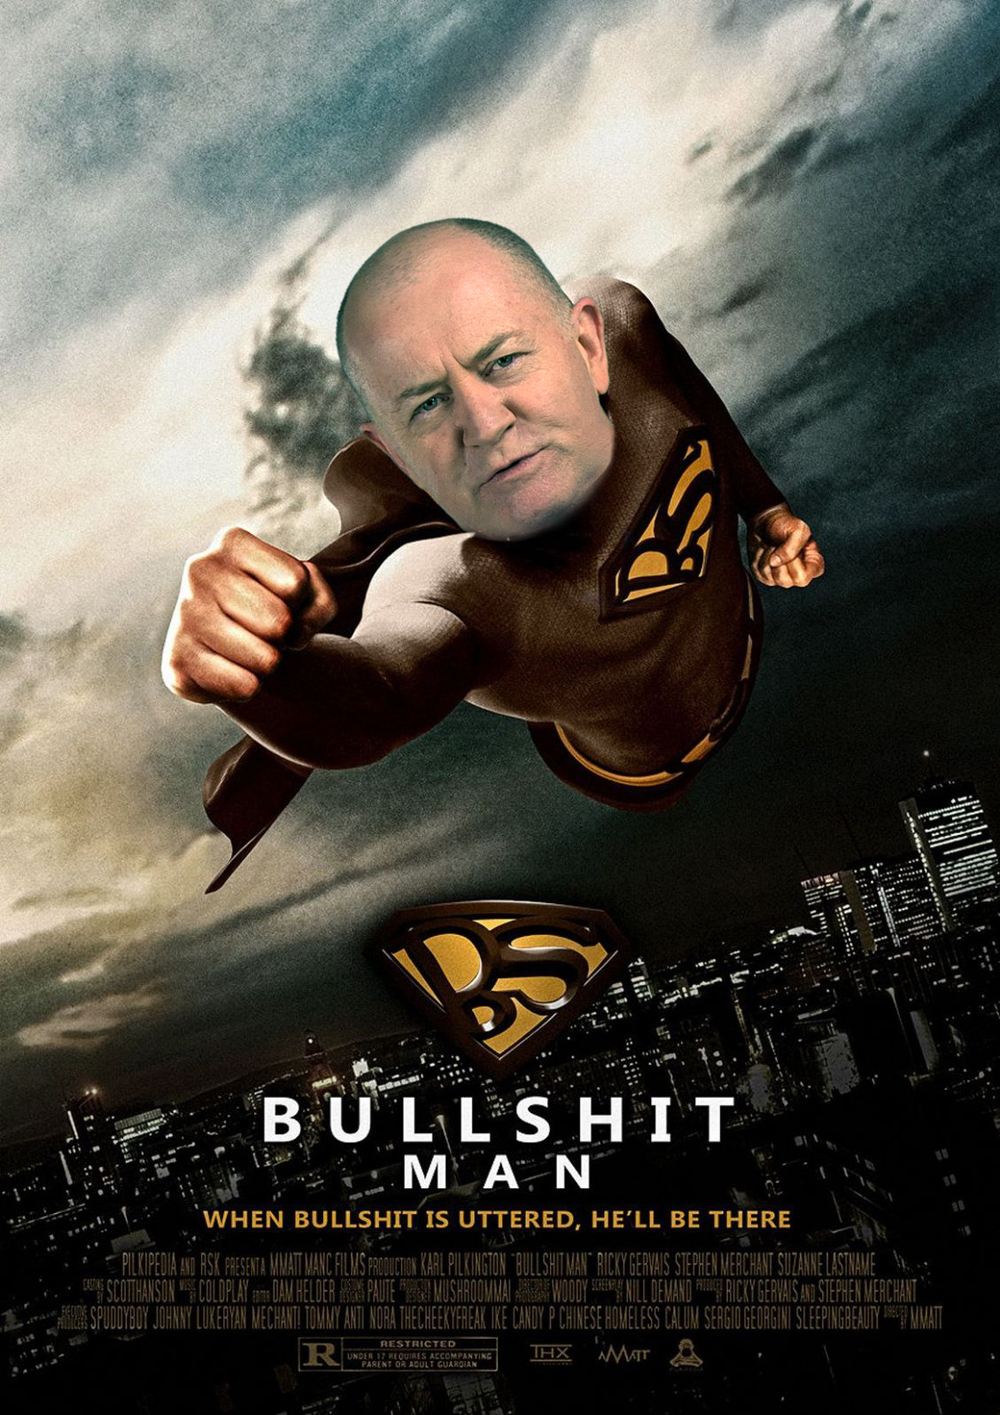 Reporter, or Bullshitman? You decide...